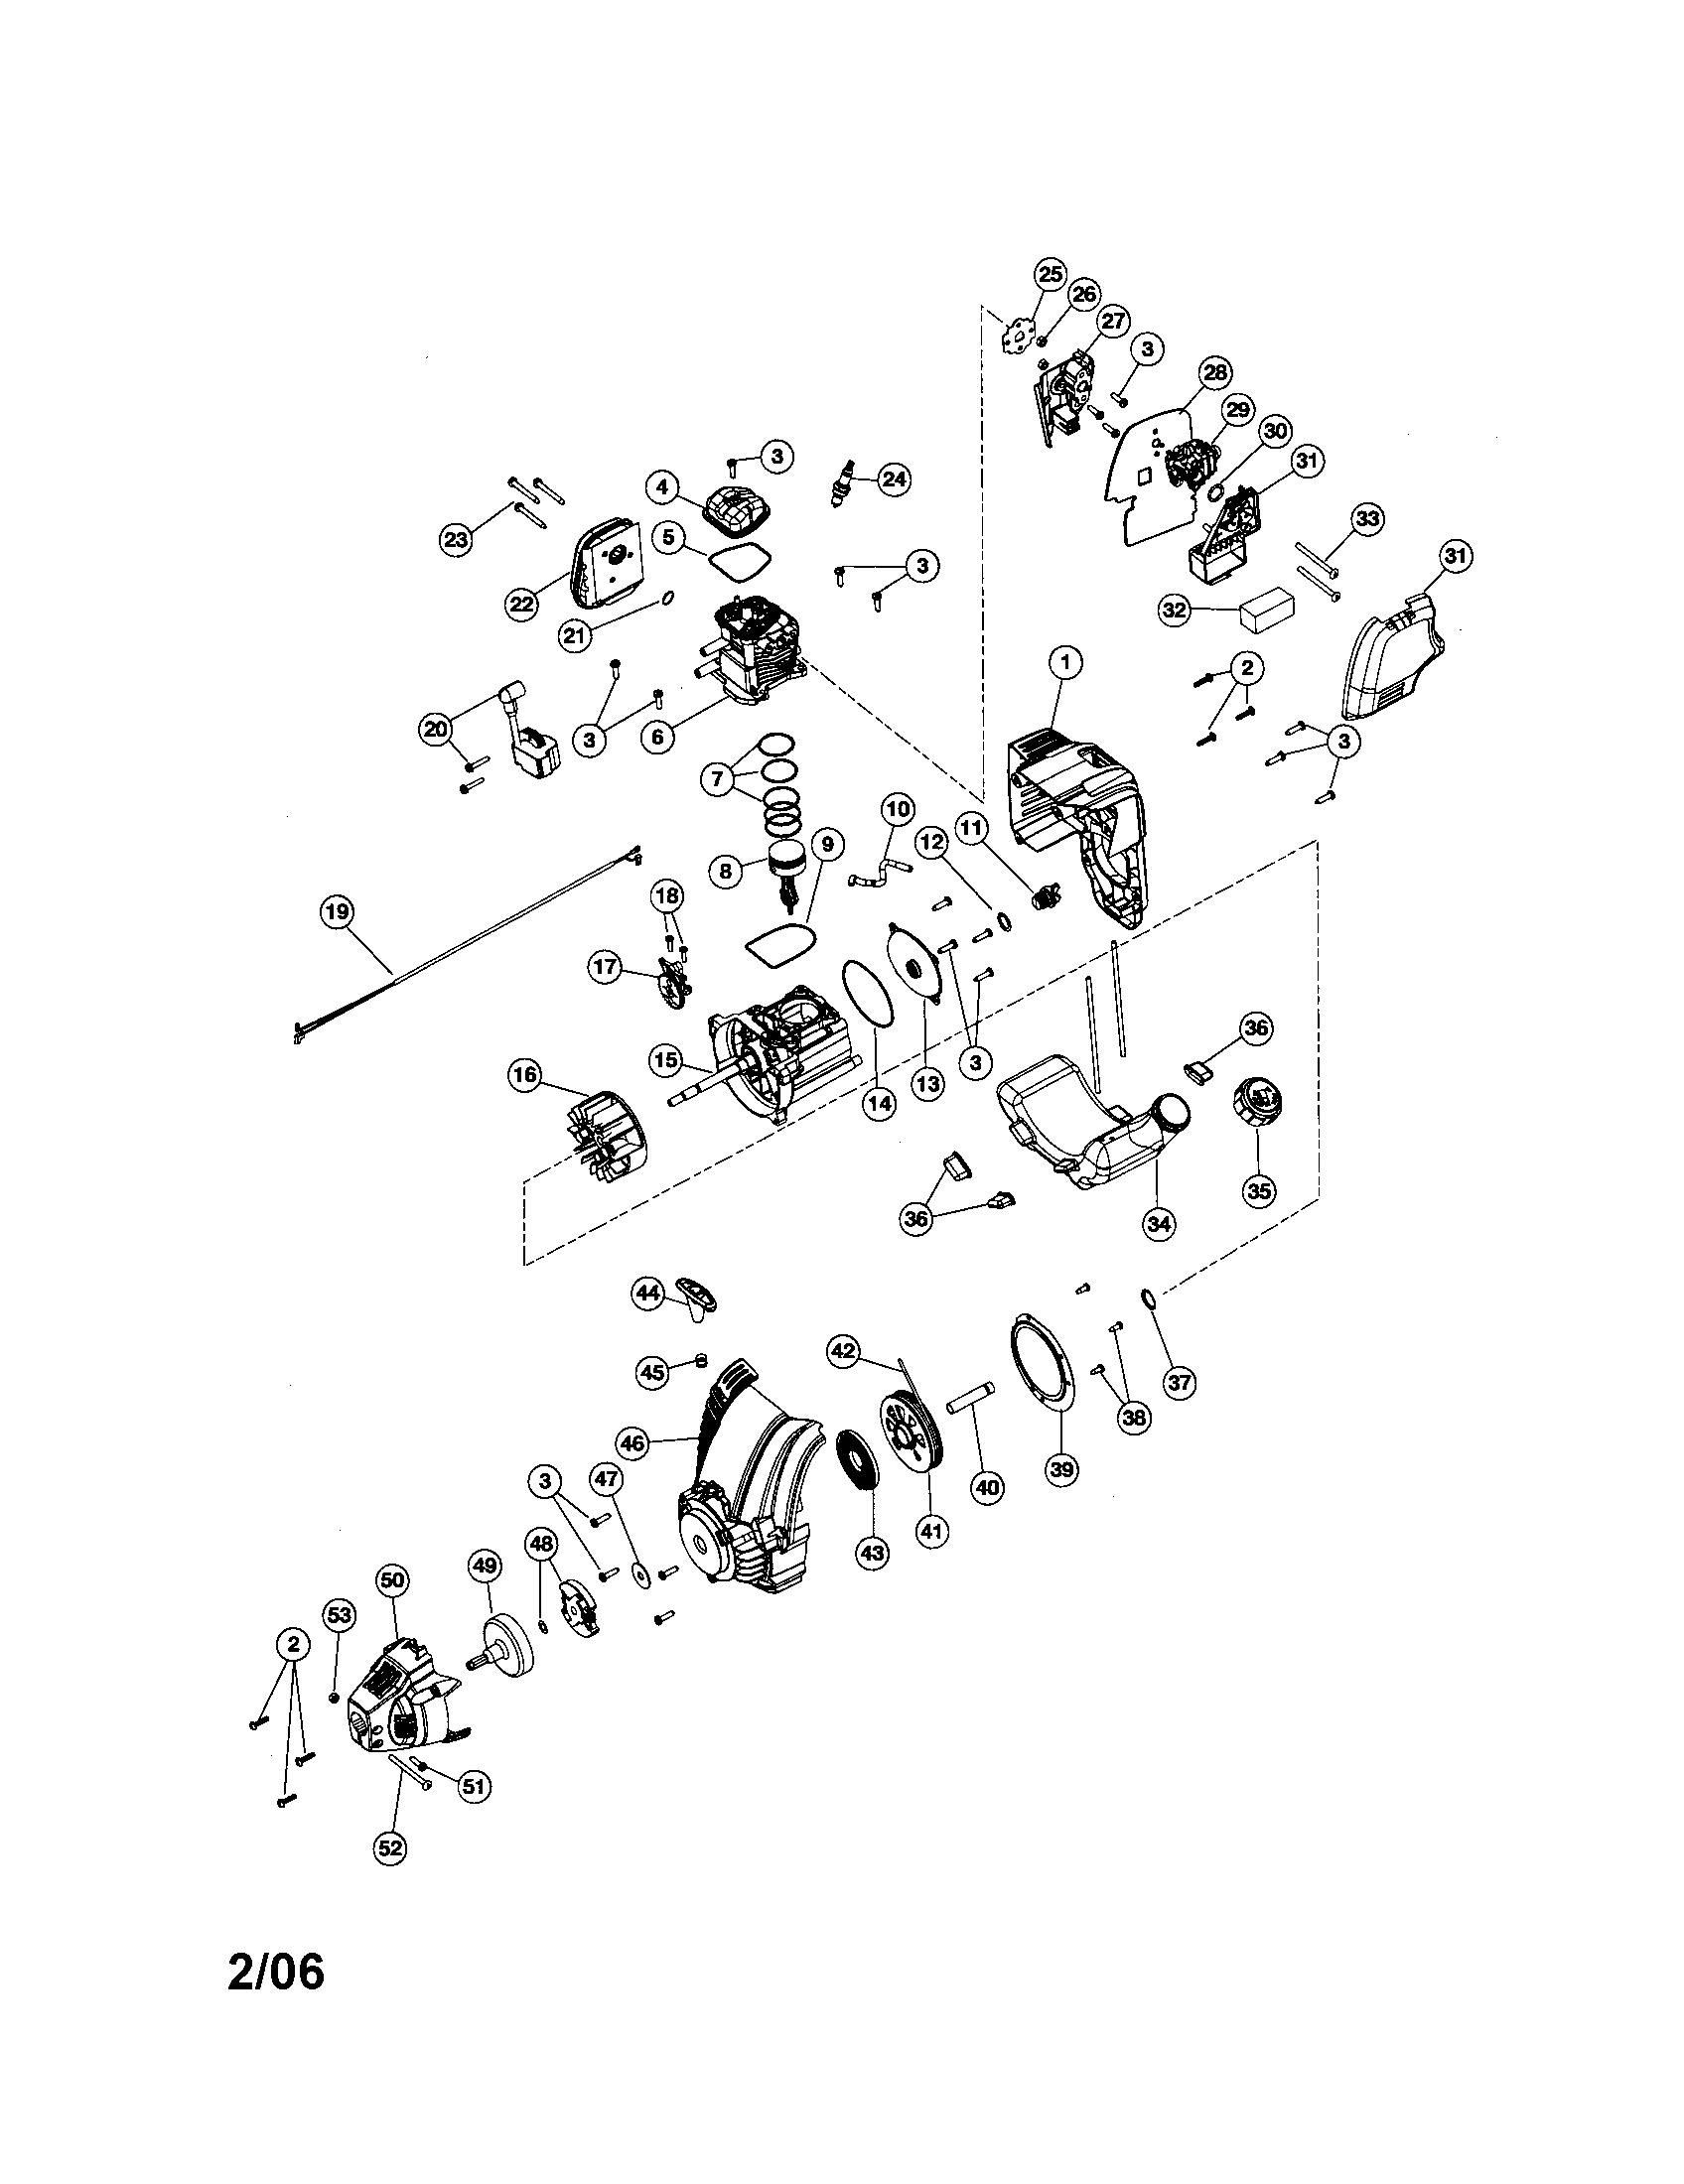 [DIAGRAM XR_5407] Troy Bilt Carburetor Diagram HD Quality